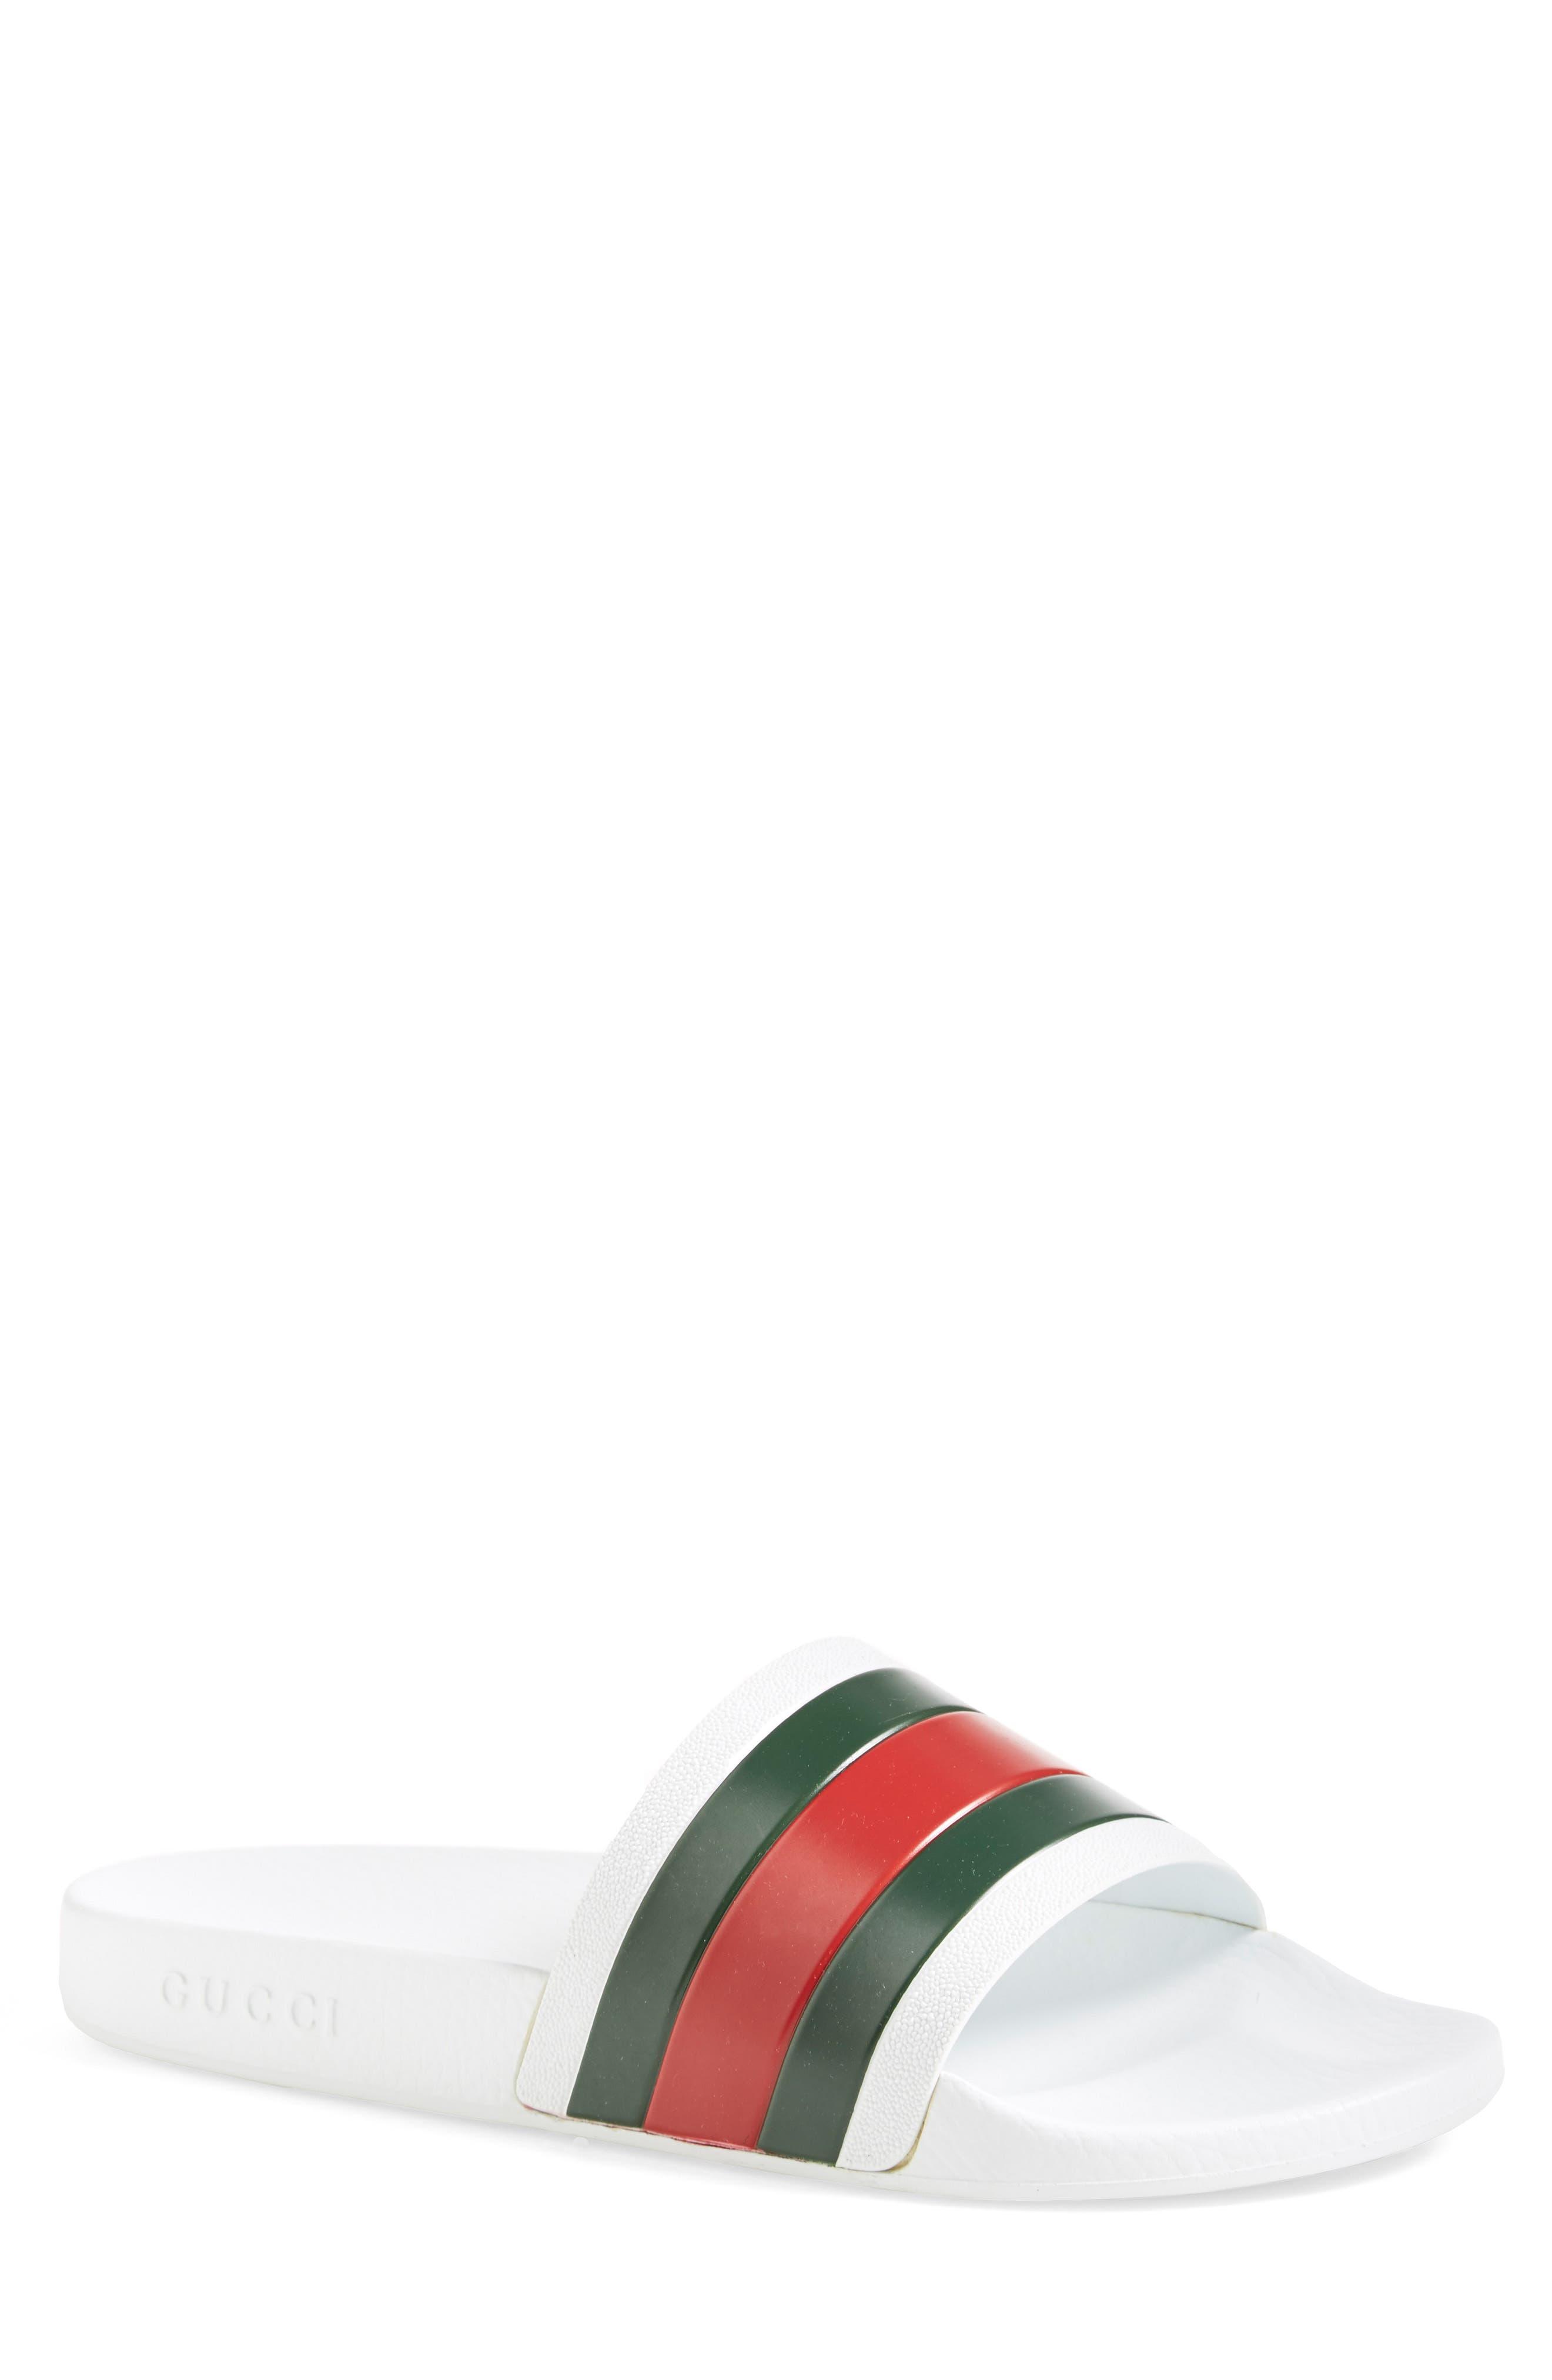 gucci sandals men price